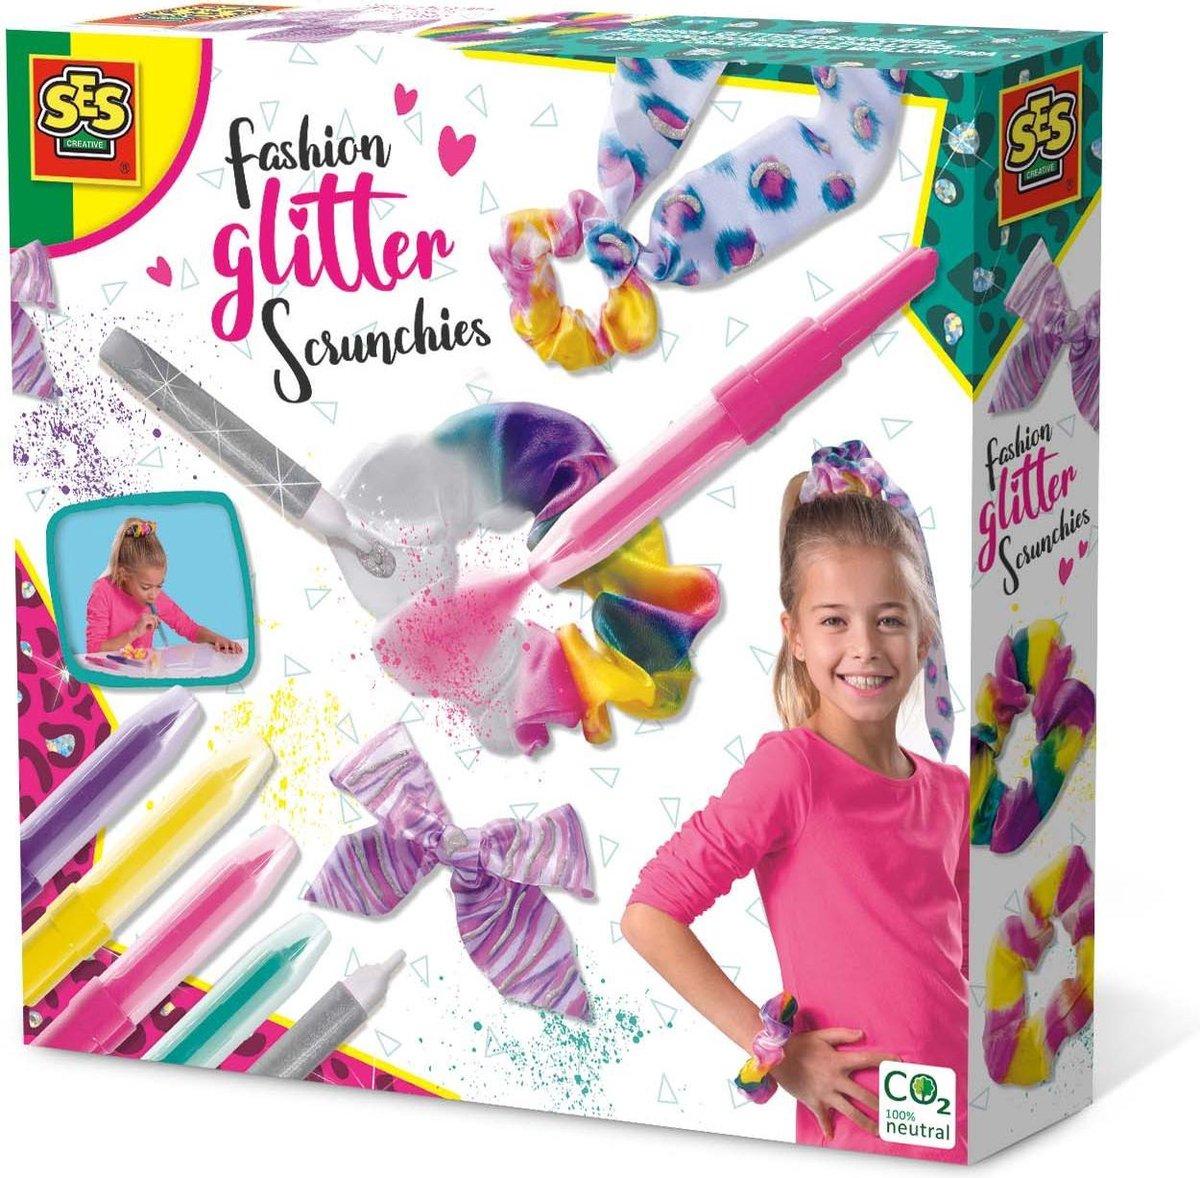 Fashion glitter scrunchies